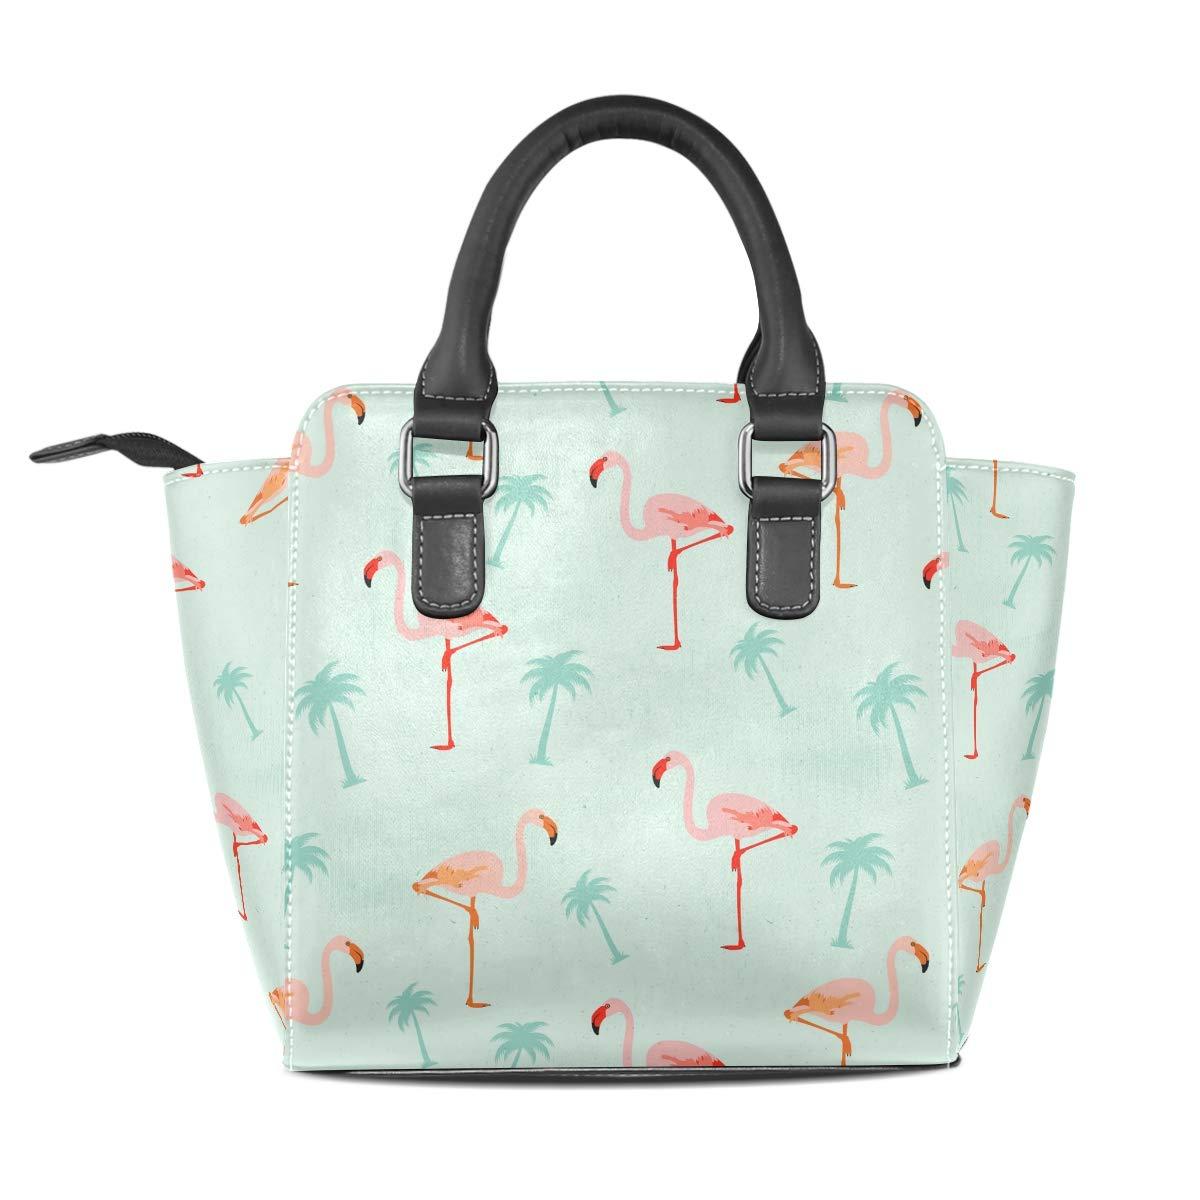 Leather Flamingo Pineapple Fruit Rivet Handbags Tote Bag Shoulder Satchel for Women Girls